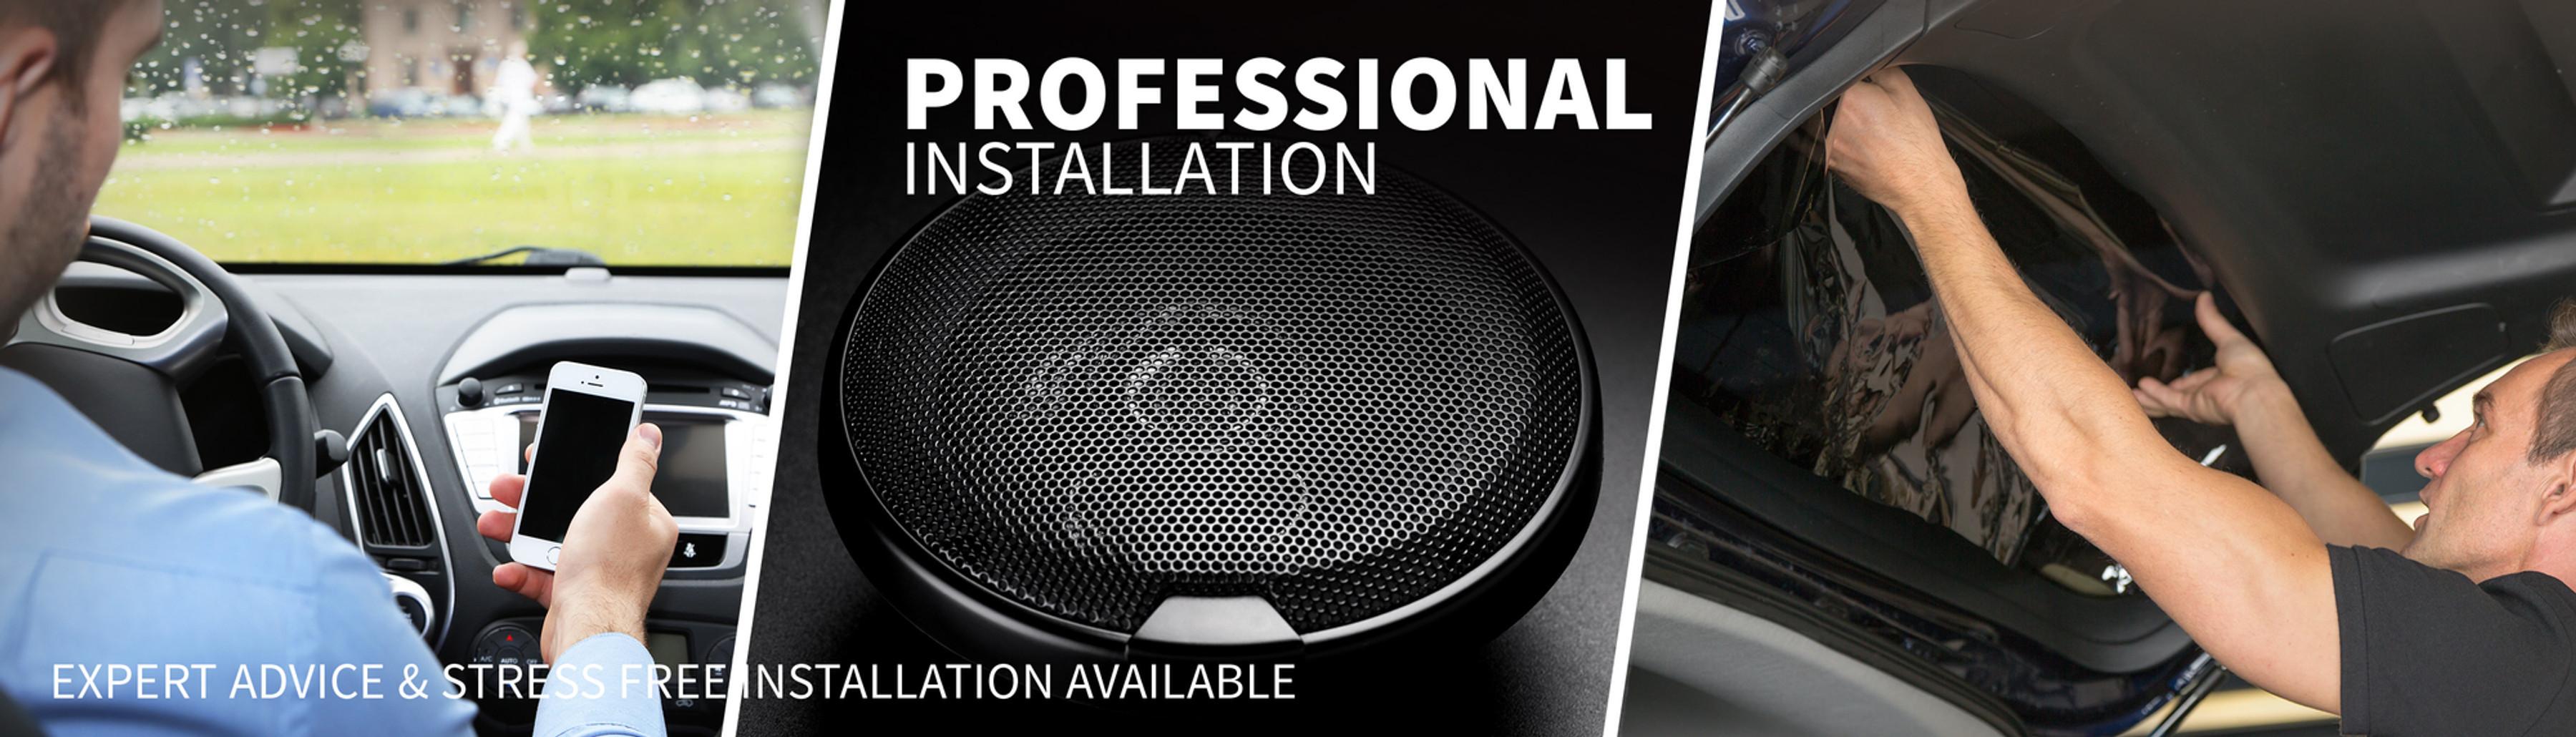 ProfessionalInstall_Banner_3600x1030.jpg